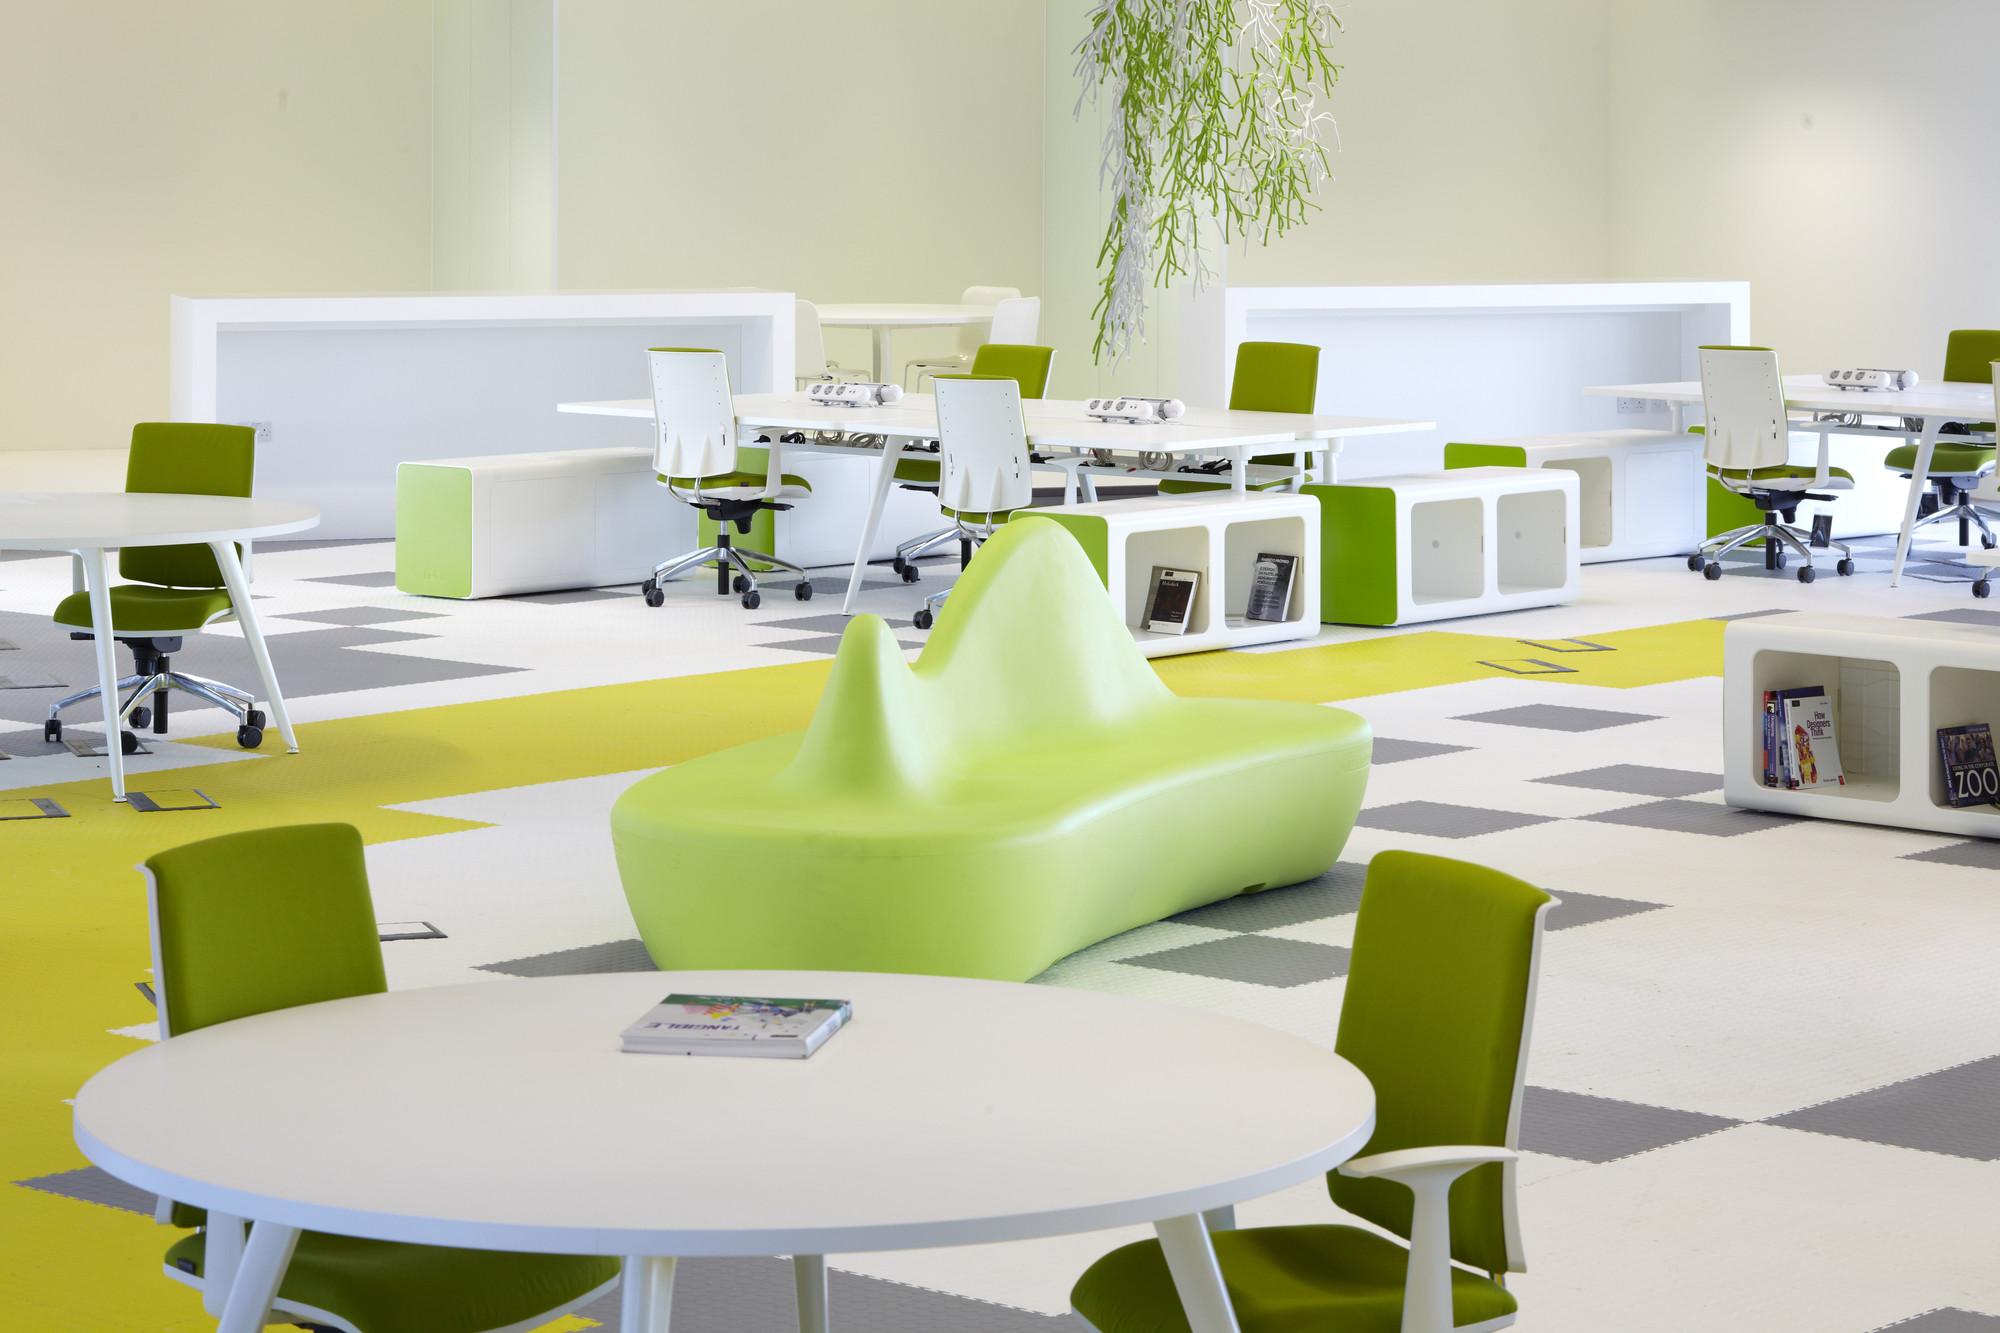 Design Studio HQ / Archer Architects